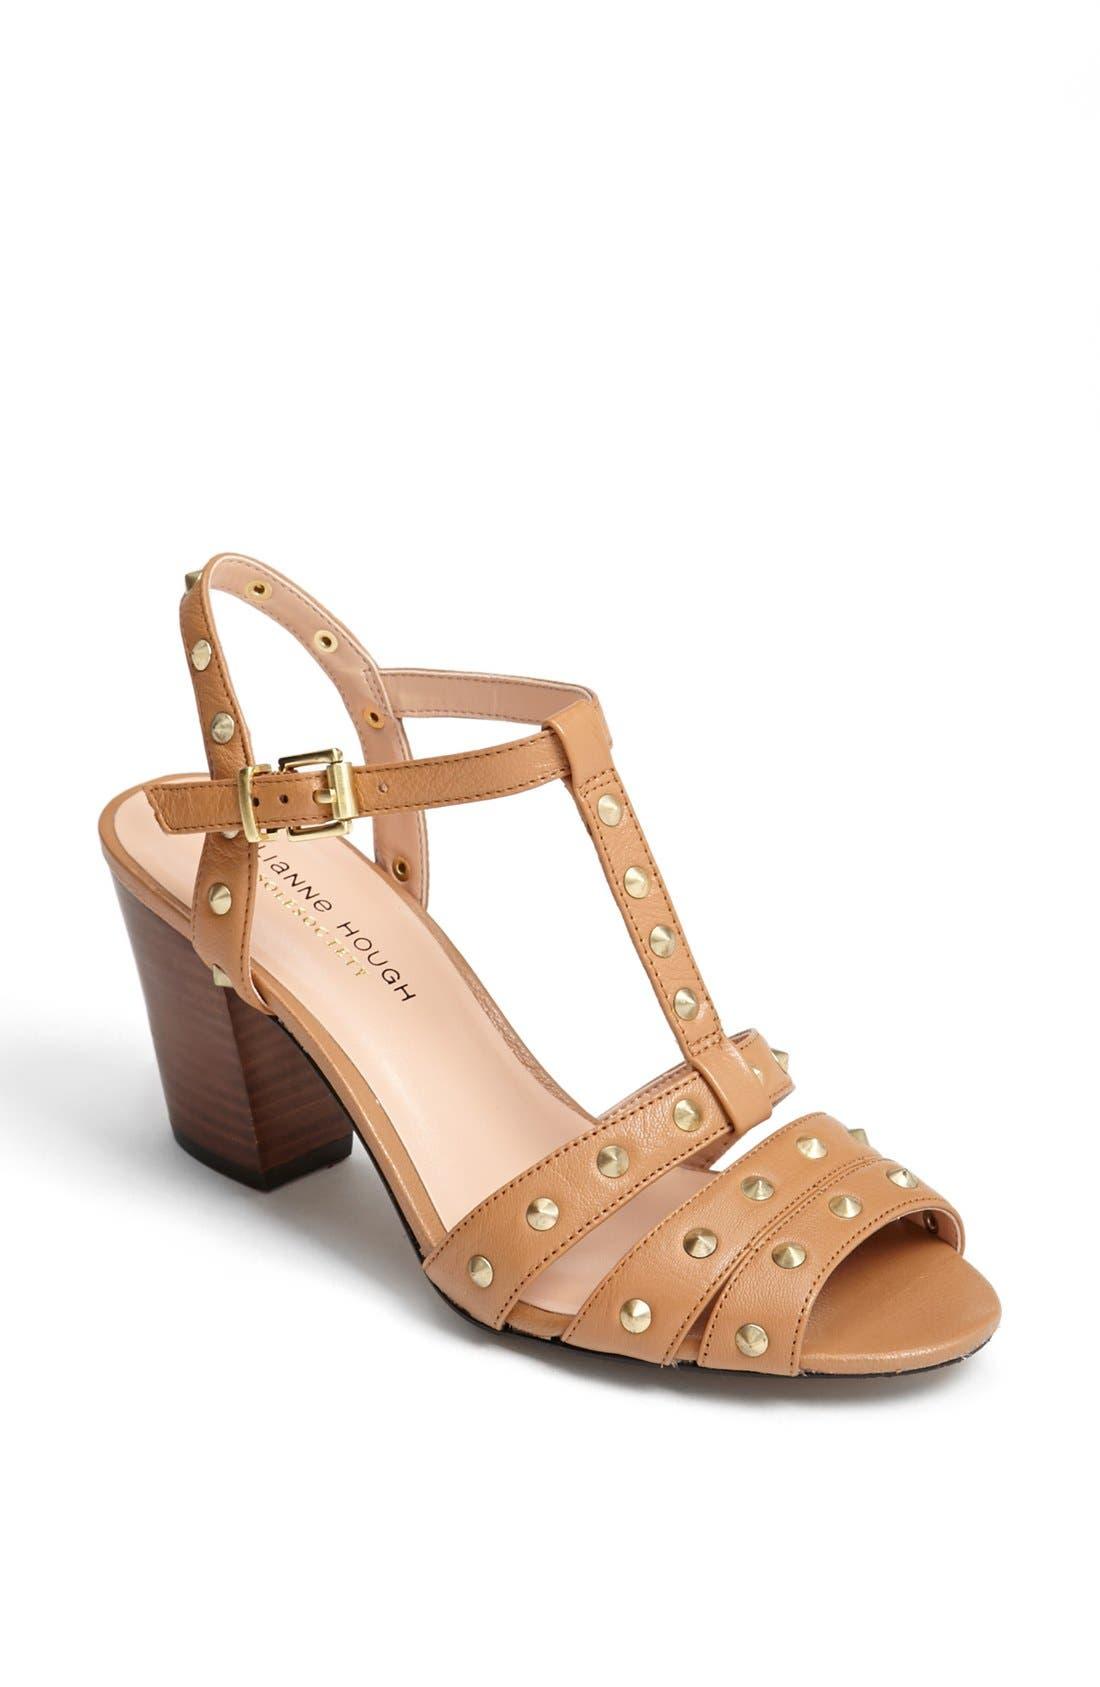 Alternate Image 1 Selected - Julianne Hough for Sole Society 'Mollie' Sandal